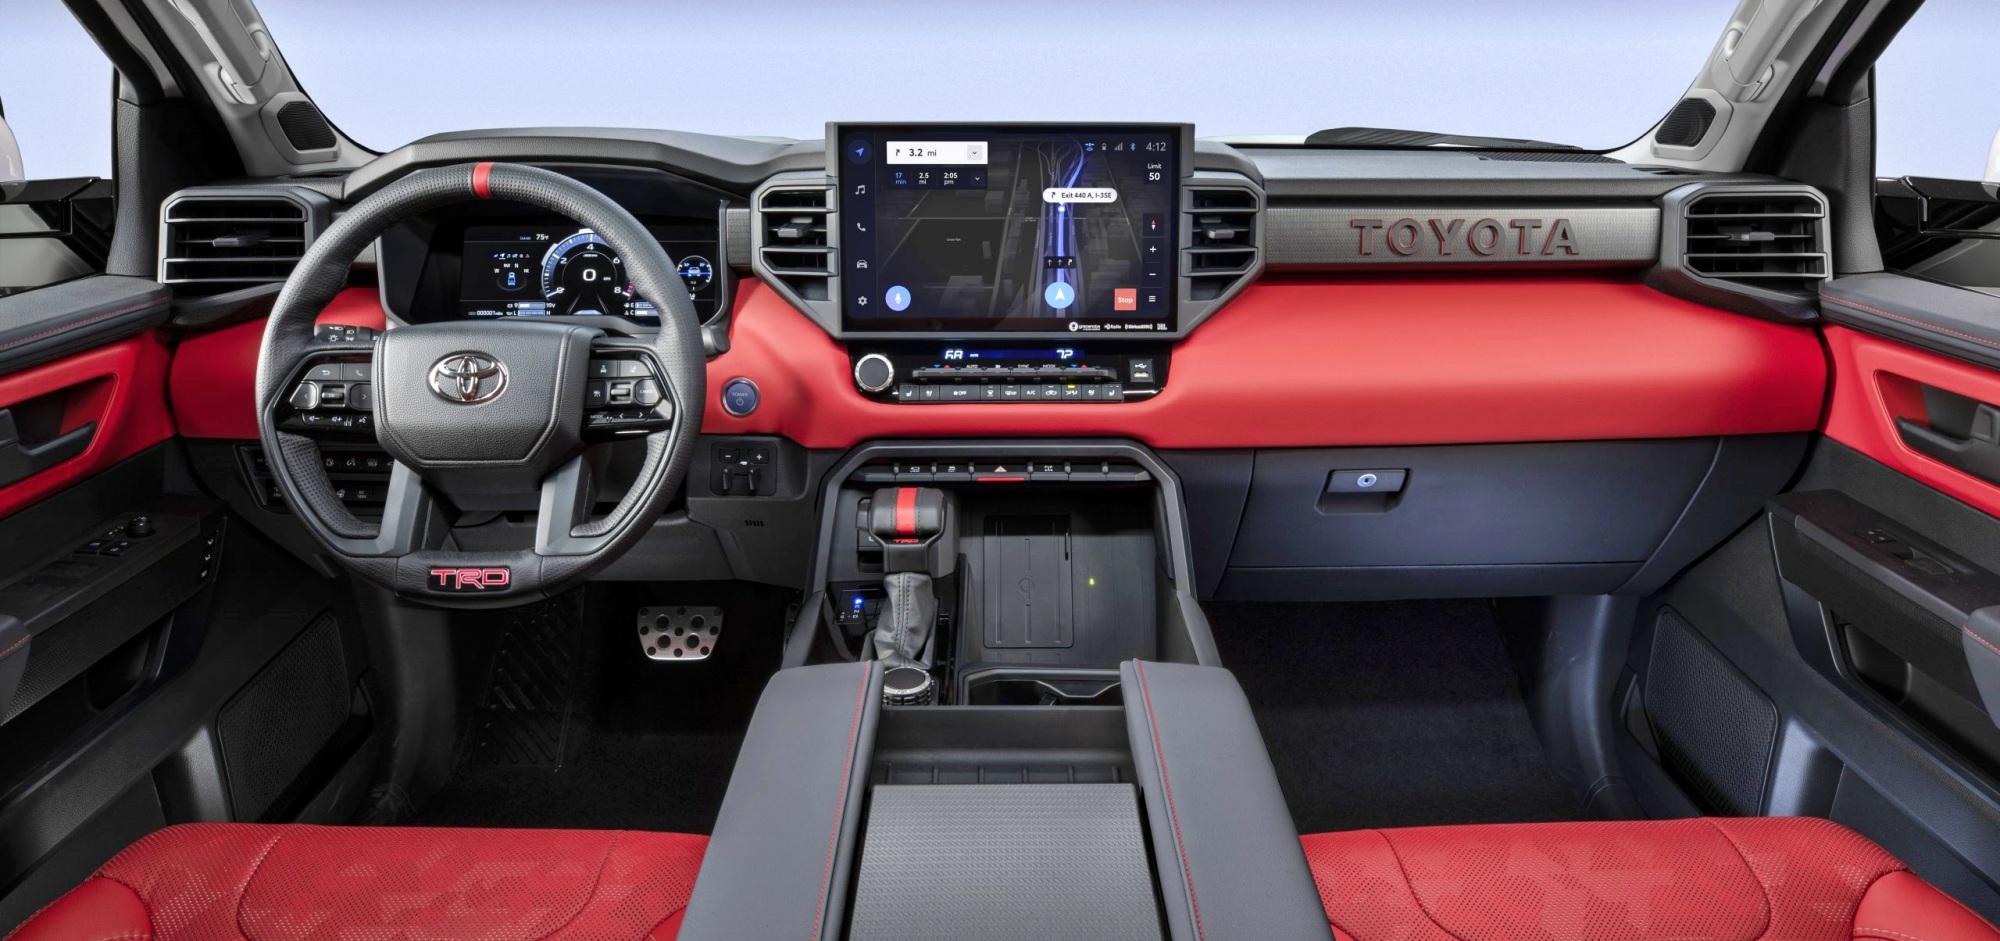 Toyota Tundra deska